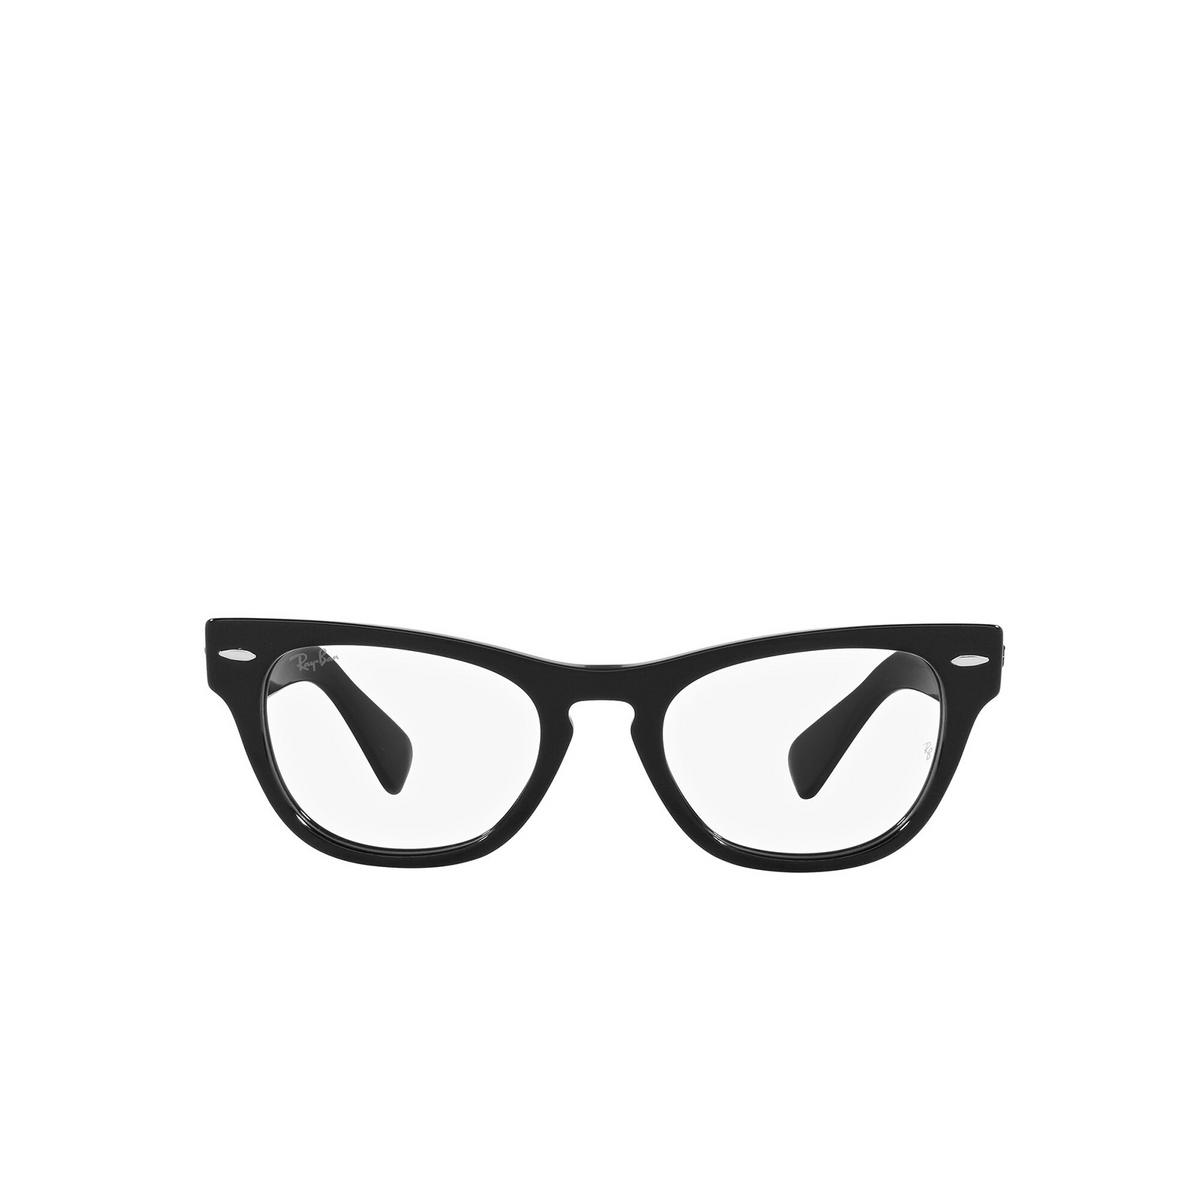 Ray-Ban® Cat-eye Eyeglasses: Laramie RX2201V color Black 2000 - front view.